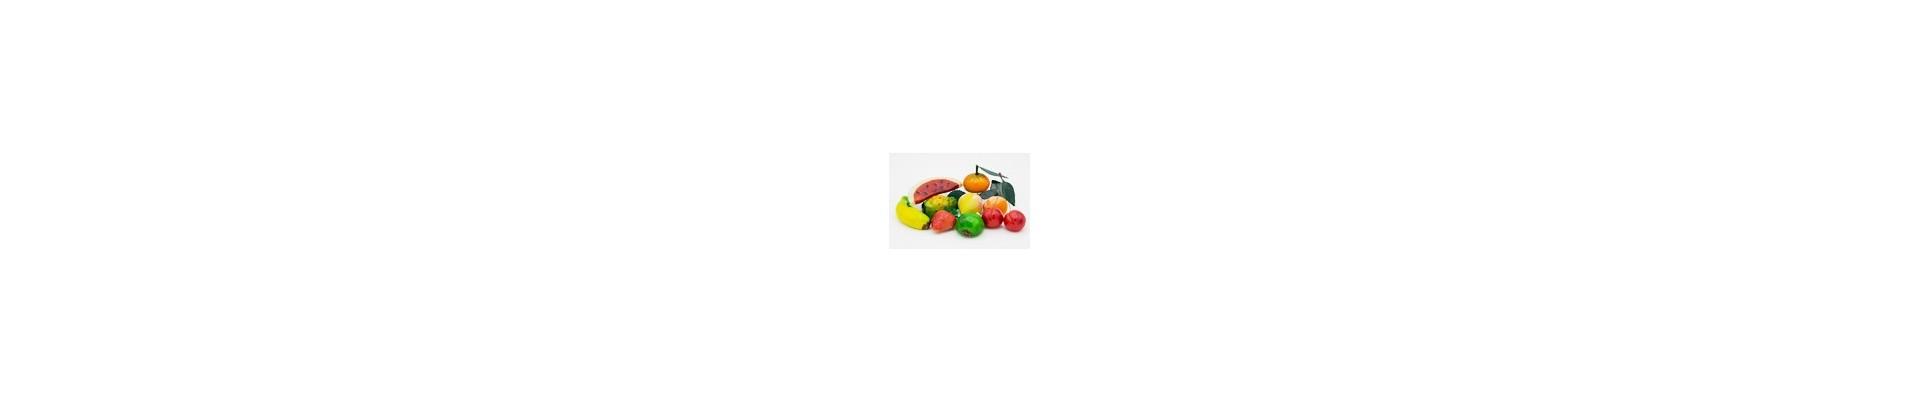 Martorana-Frucht